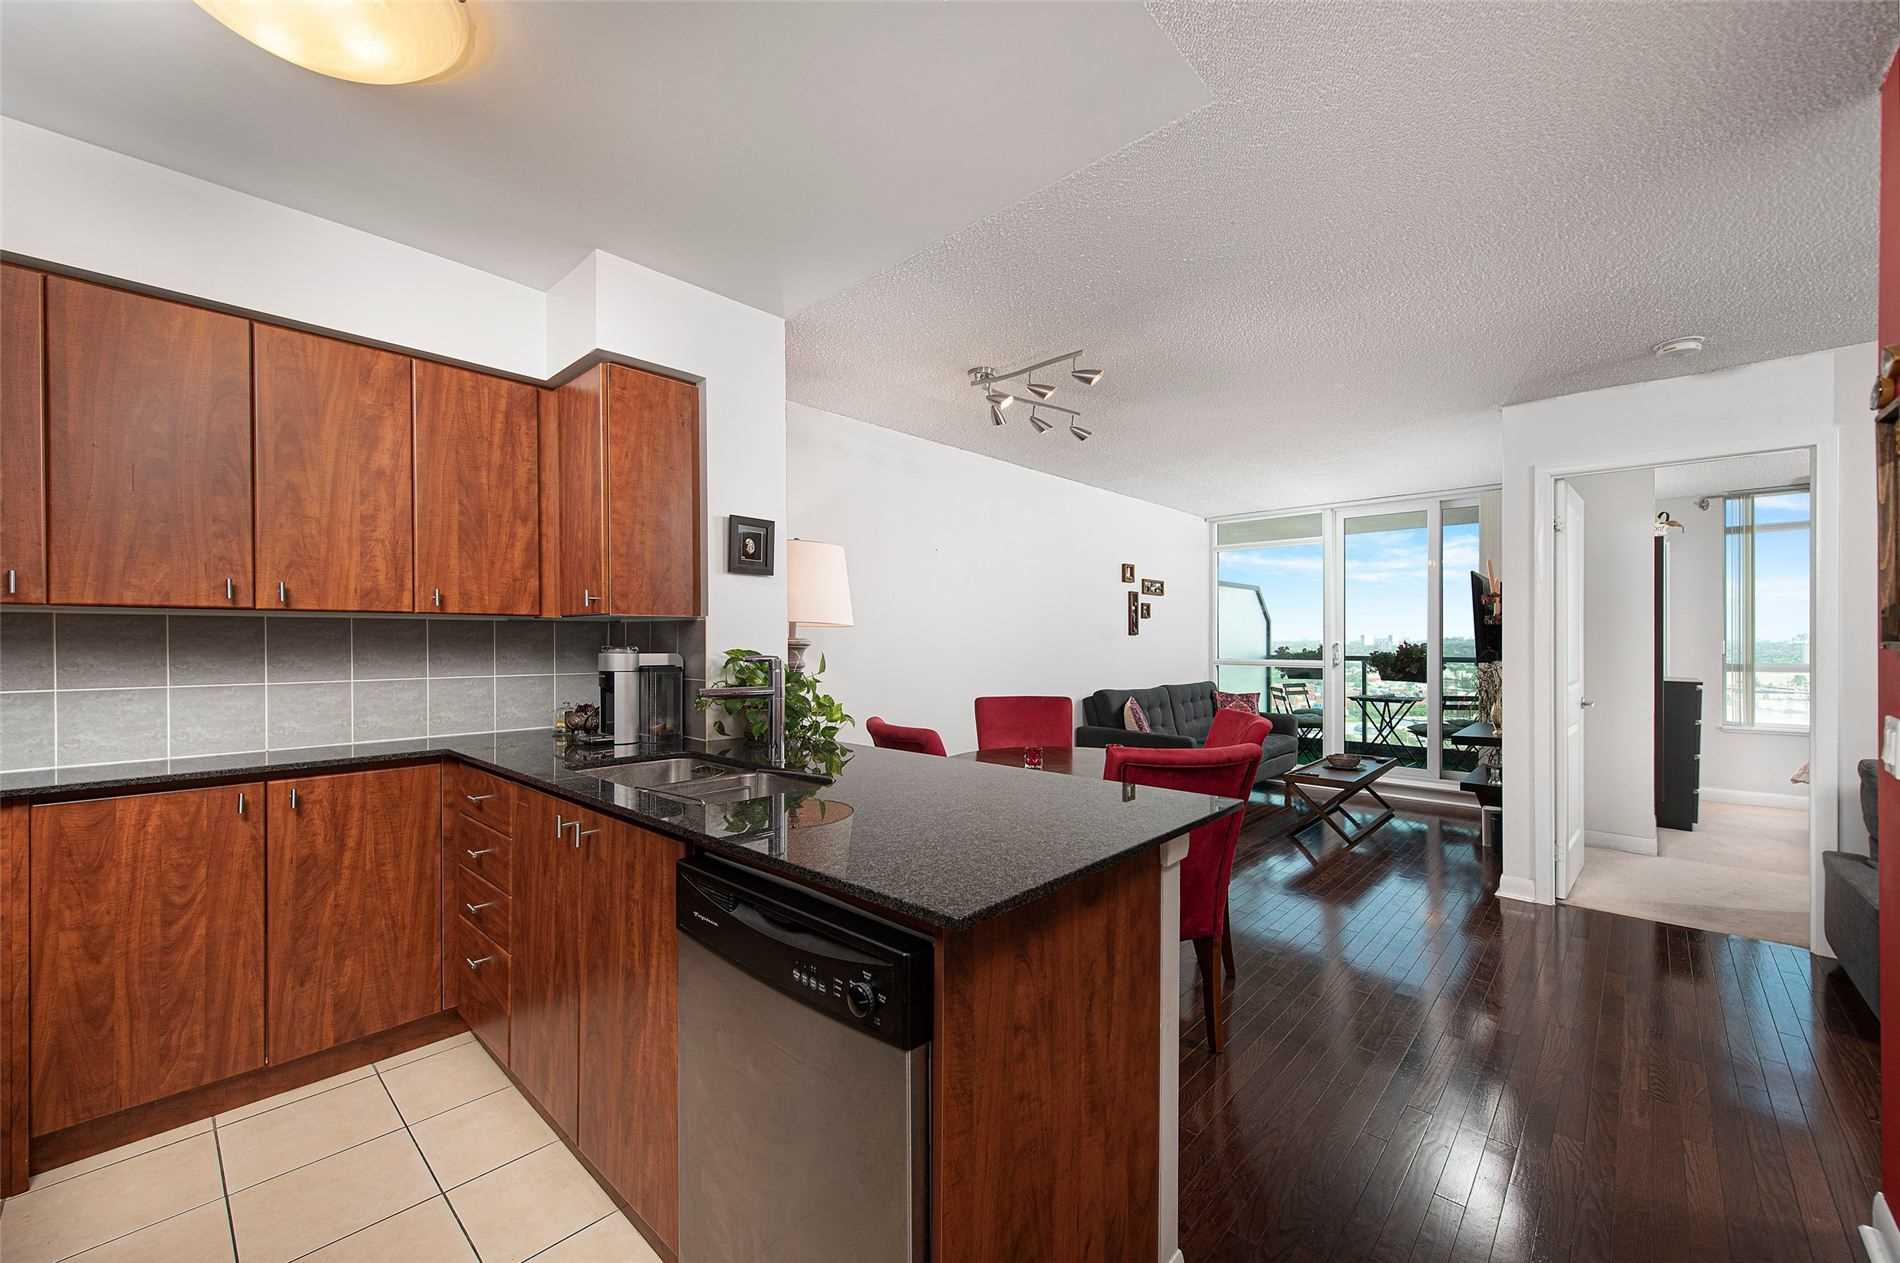 225 Sherway Gardens Rd, Toronto, Ontario M9C0A3, 1 Bedroom Bedrooms, 5 Rooms Rooms,1 BathroomBathrooms,Condo Apt,For Sale,Sherway Gardens,W4916020